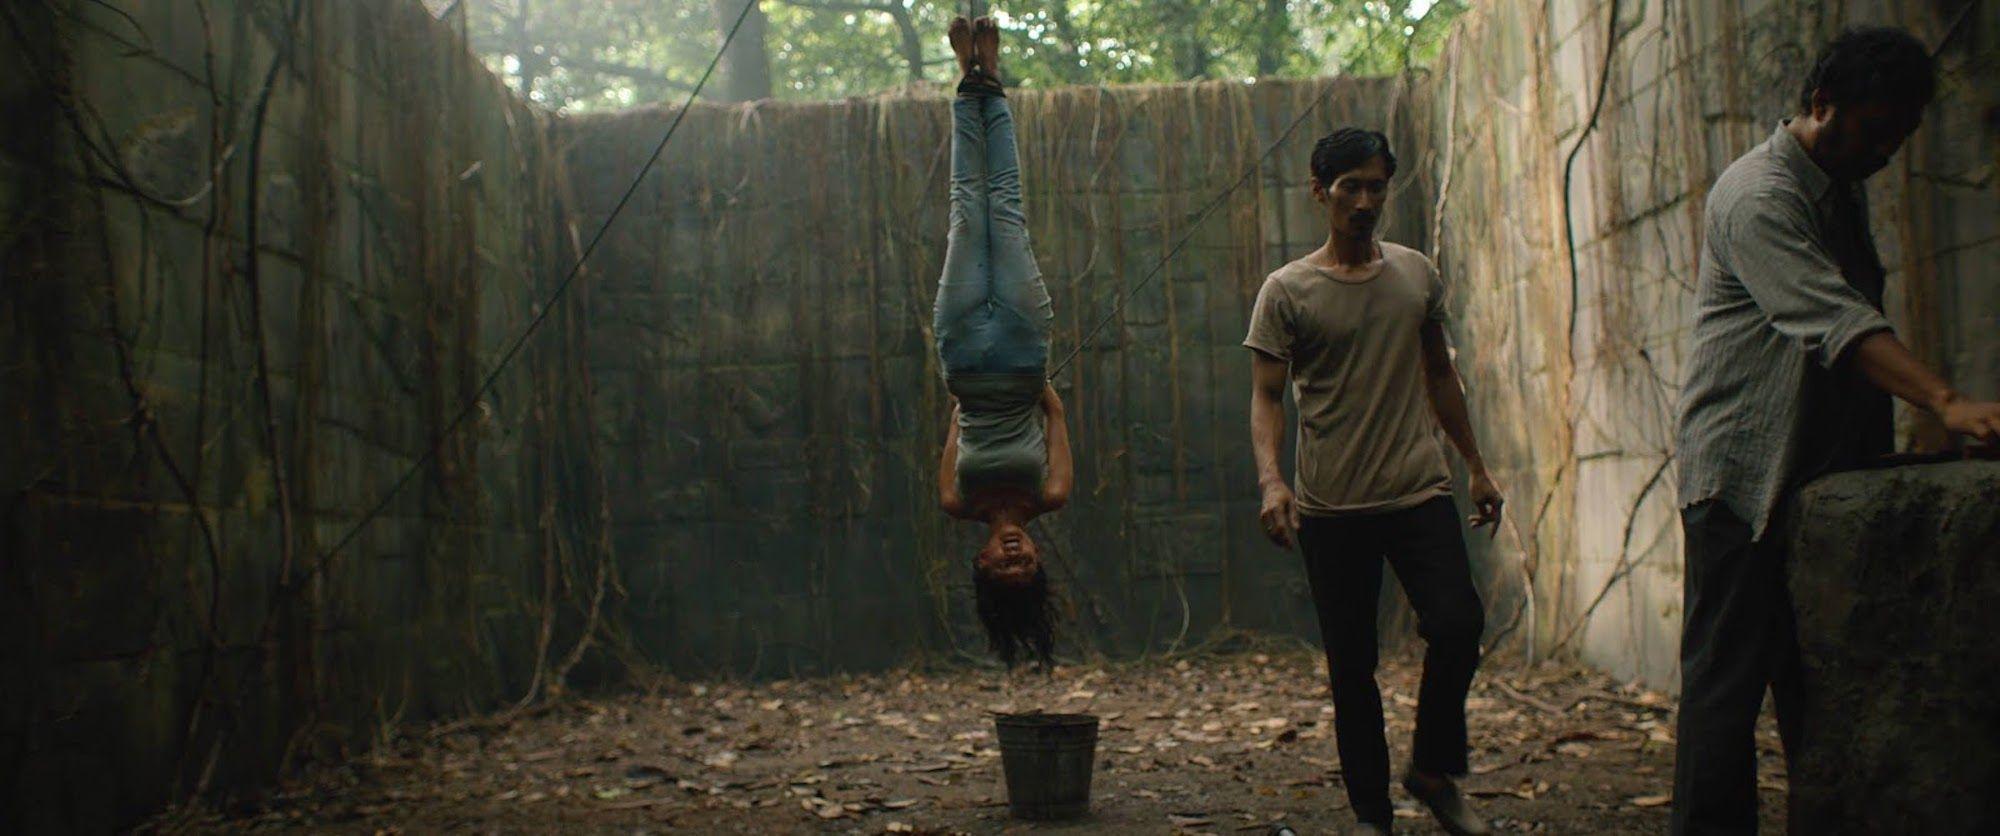 Impetigore, crítica de la película en el Festival de Sitges